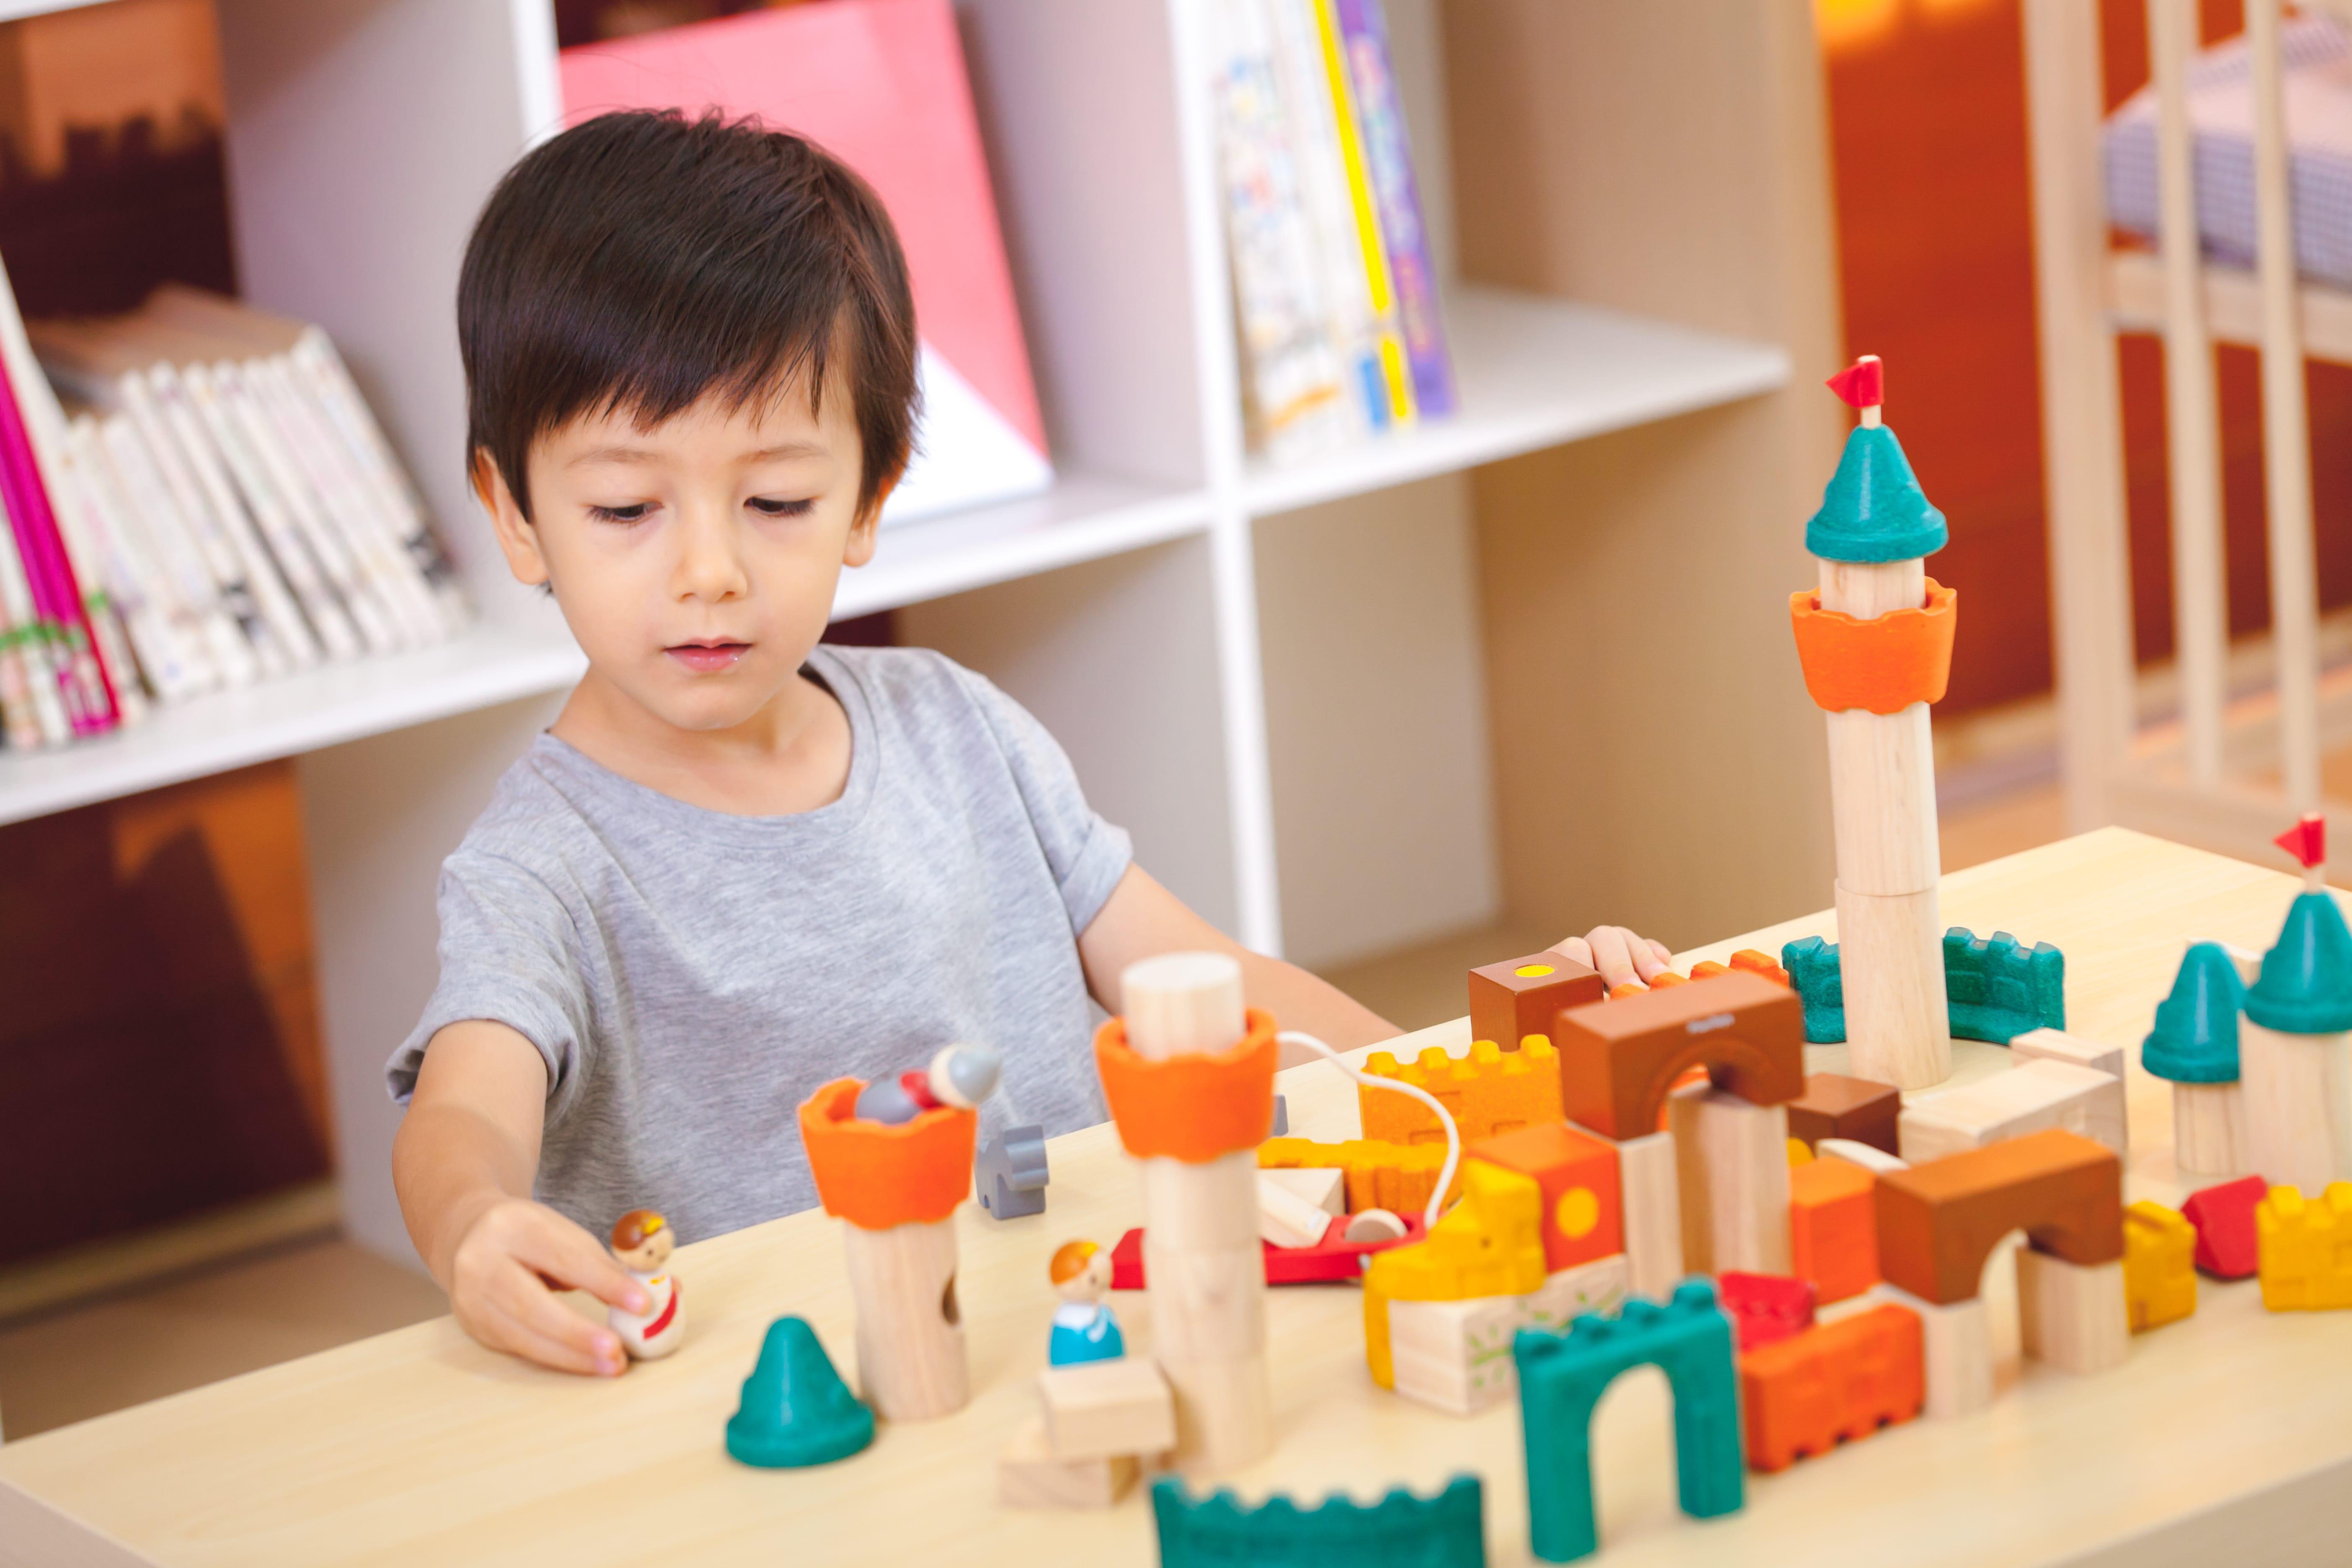 5696_PlanToys_FANTASY_BLOCKS_Blocks_and_Construction_Fine_Motor_Coordination_Creative_Tactile_3yrs_Wooden_toys_Education_toys_Safety_Toys_Non-toxic_3.jpg